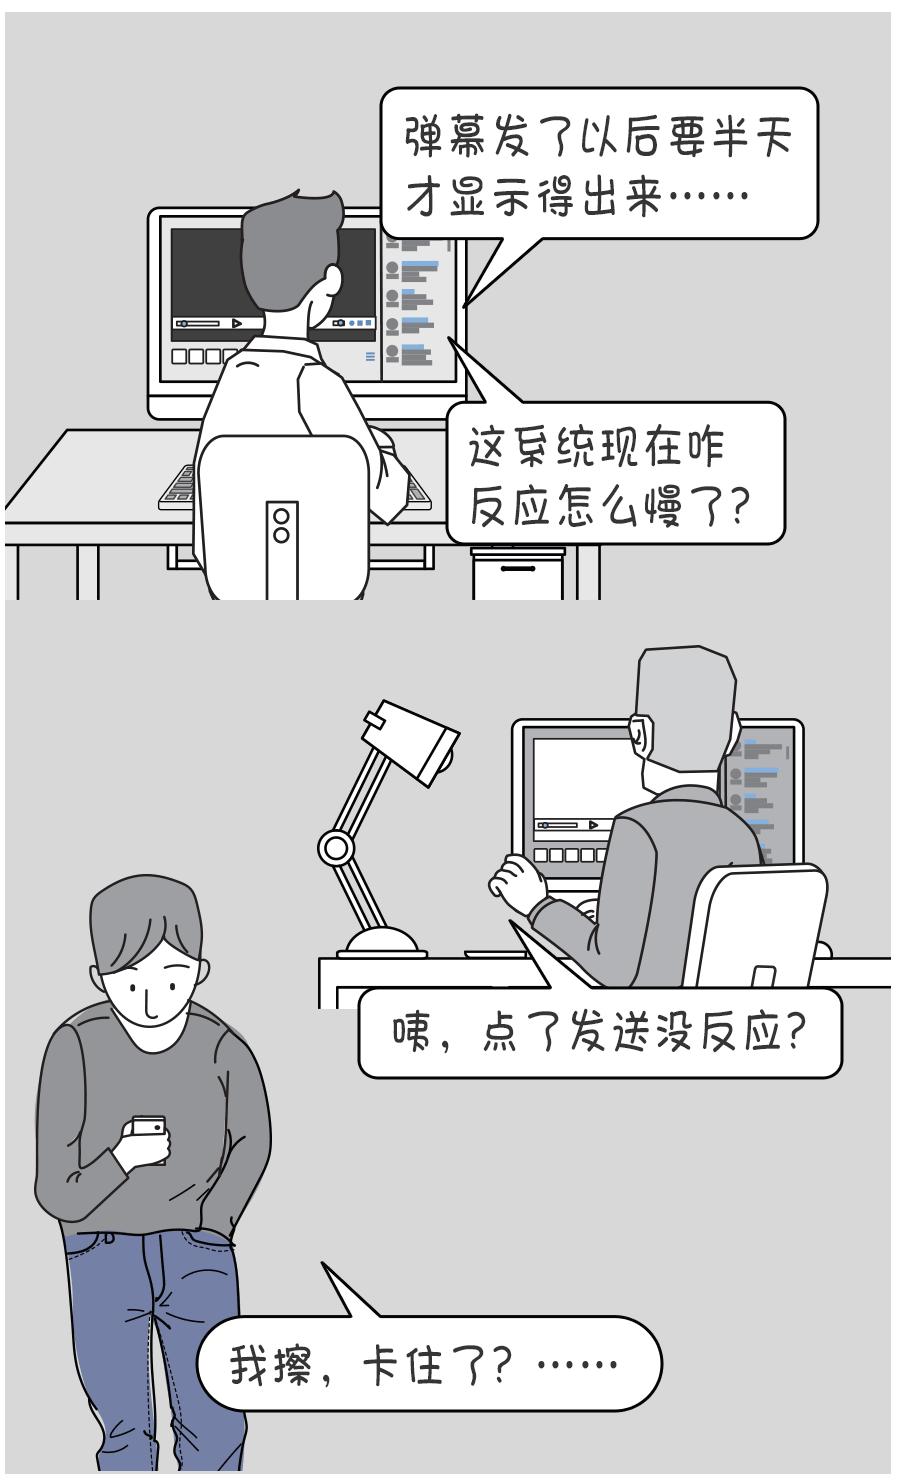 qiniu_09_05